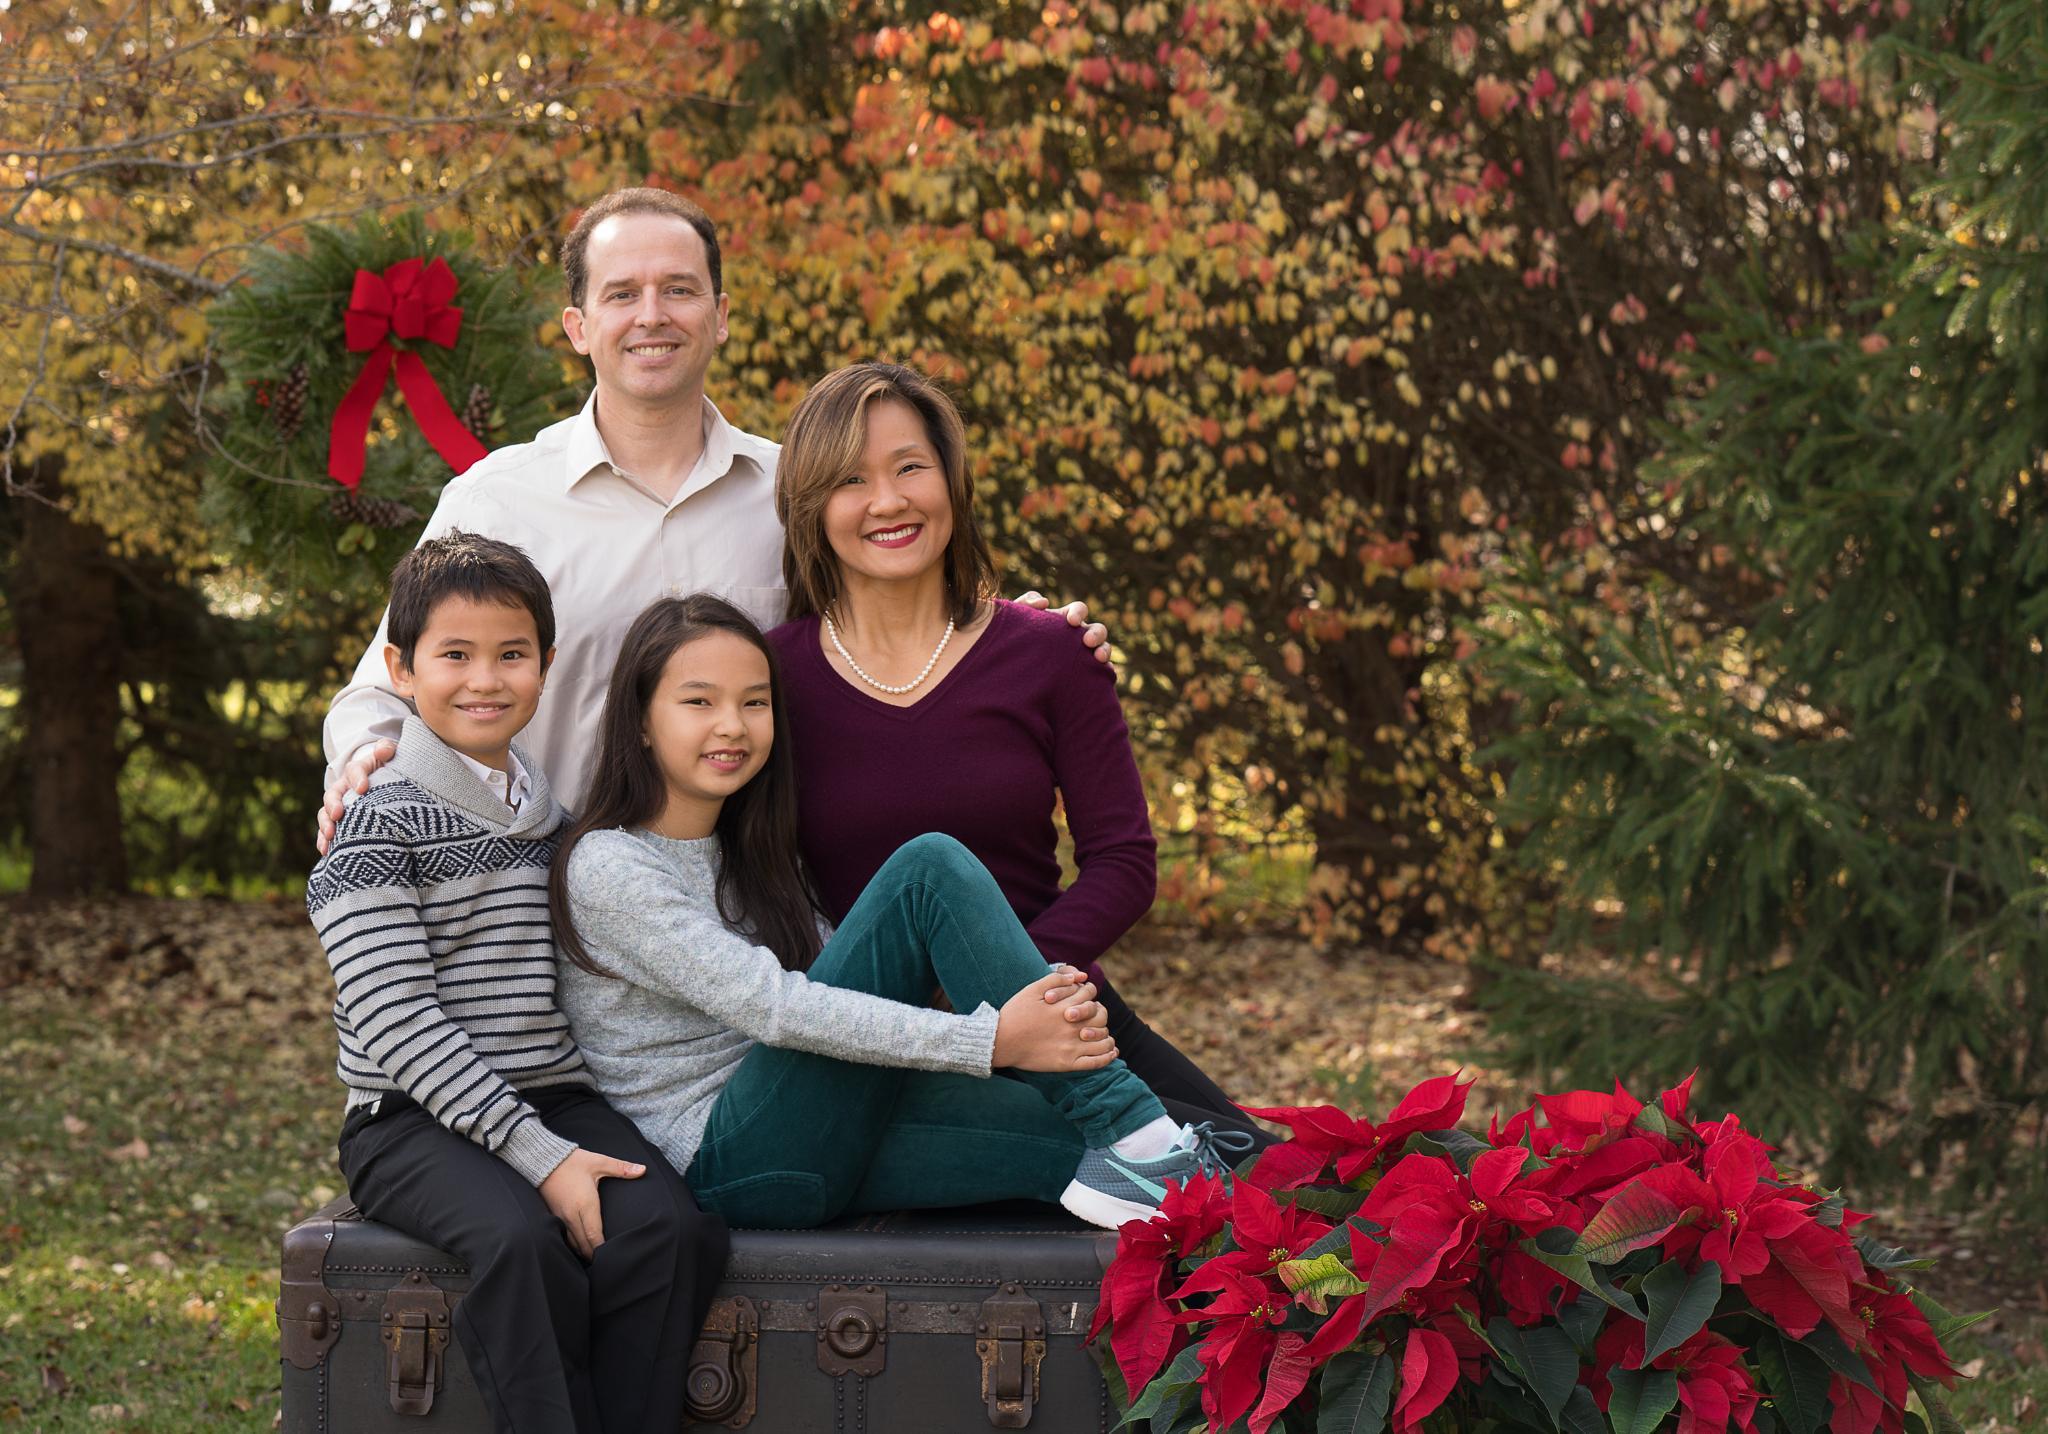 Fall-family-portraits-new-jersey.jpg